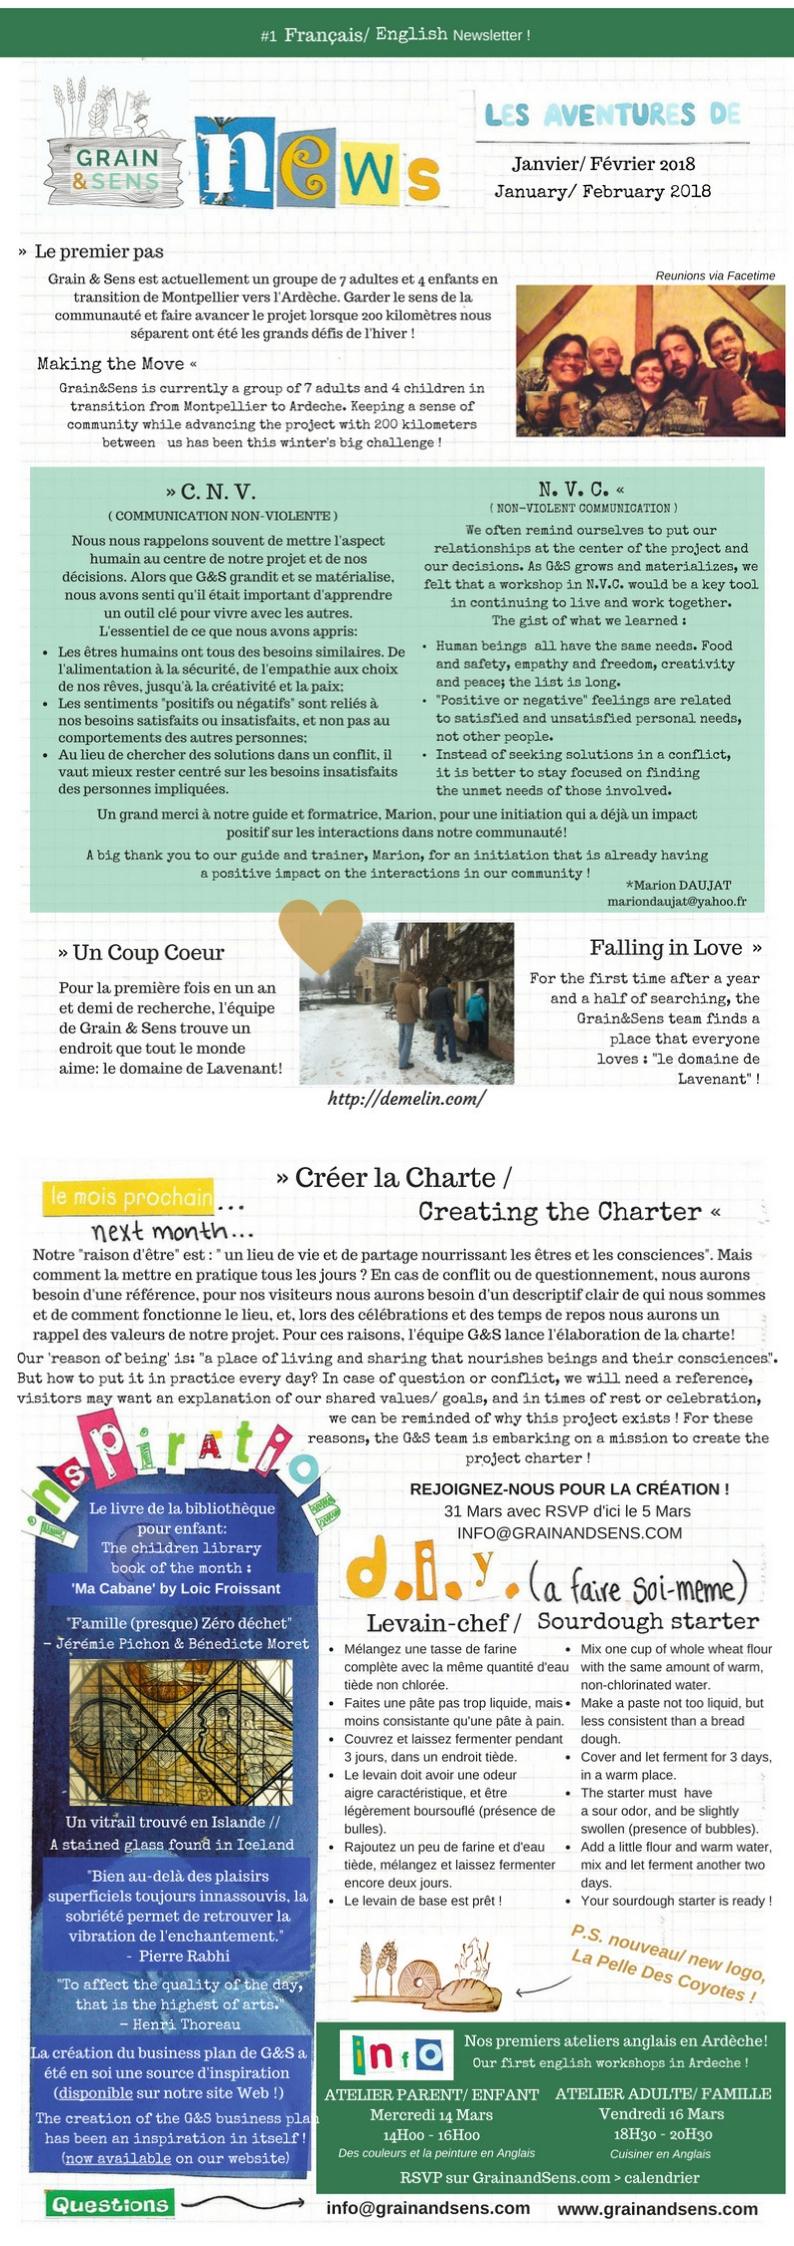 Jan%2F Feb 2018 Infographic.jpg